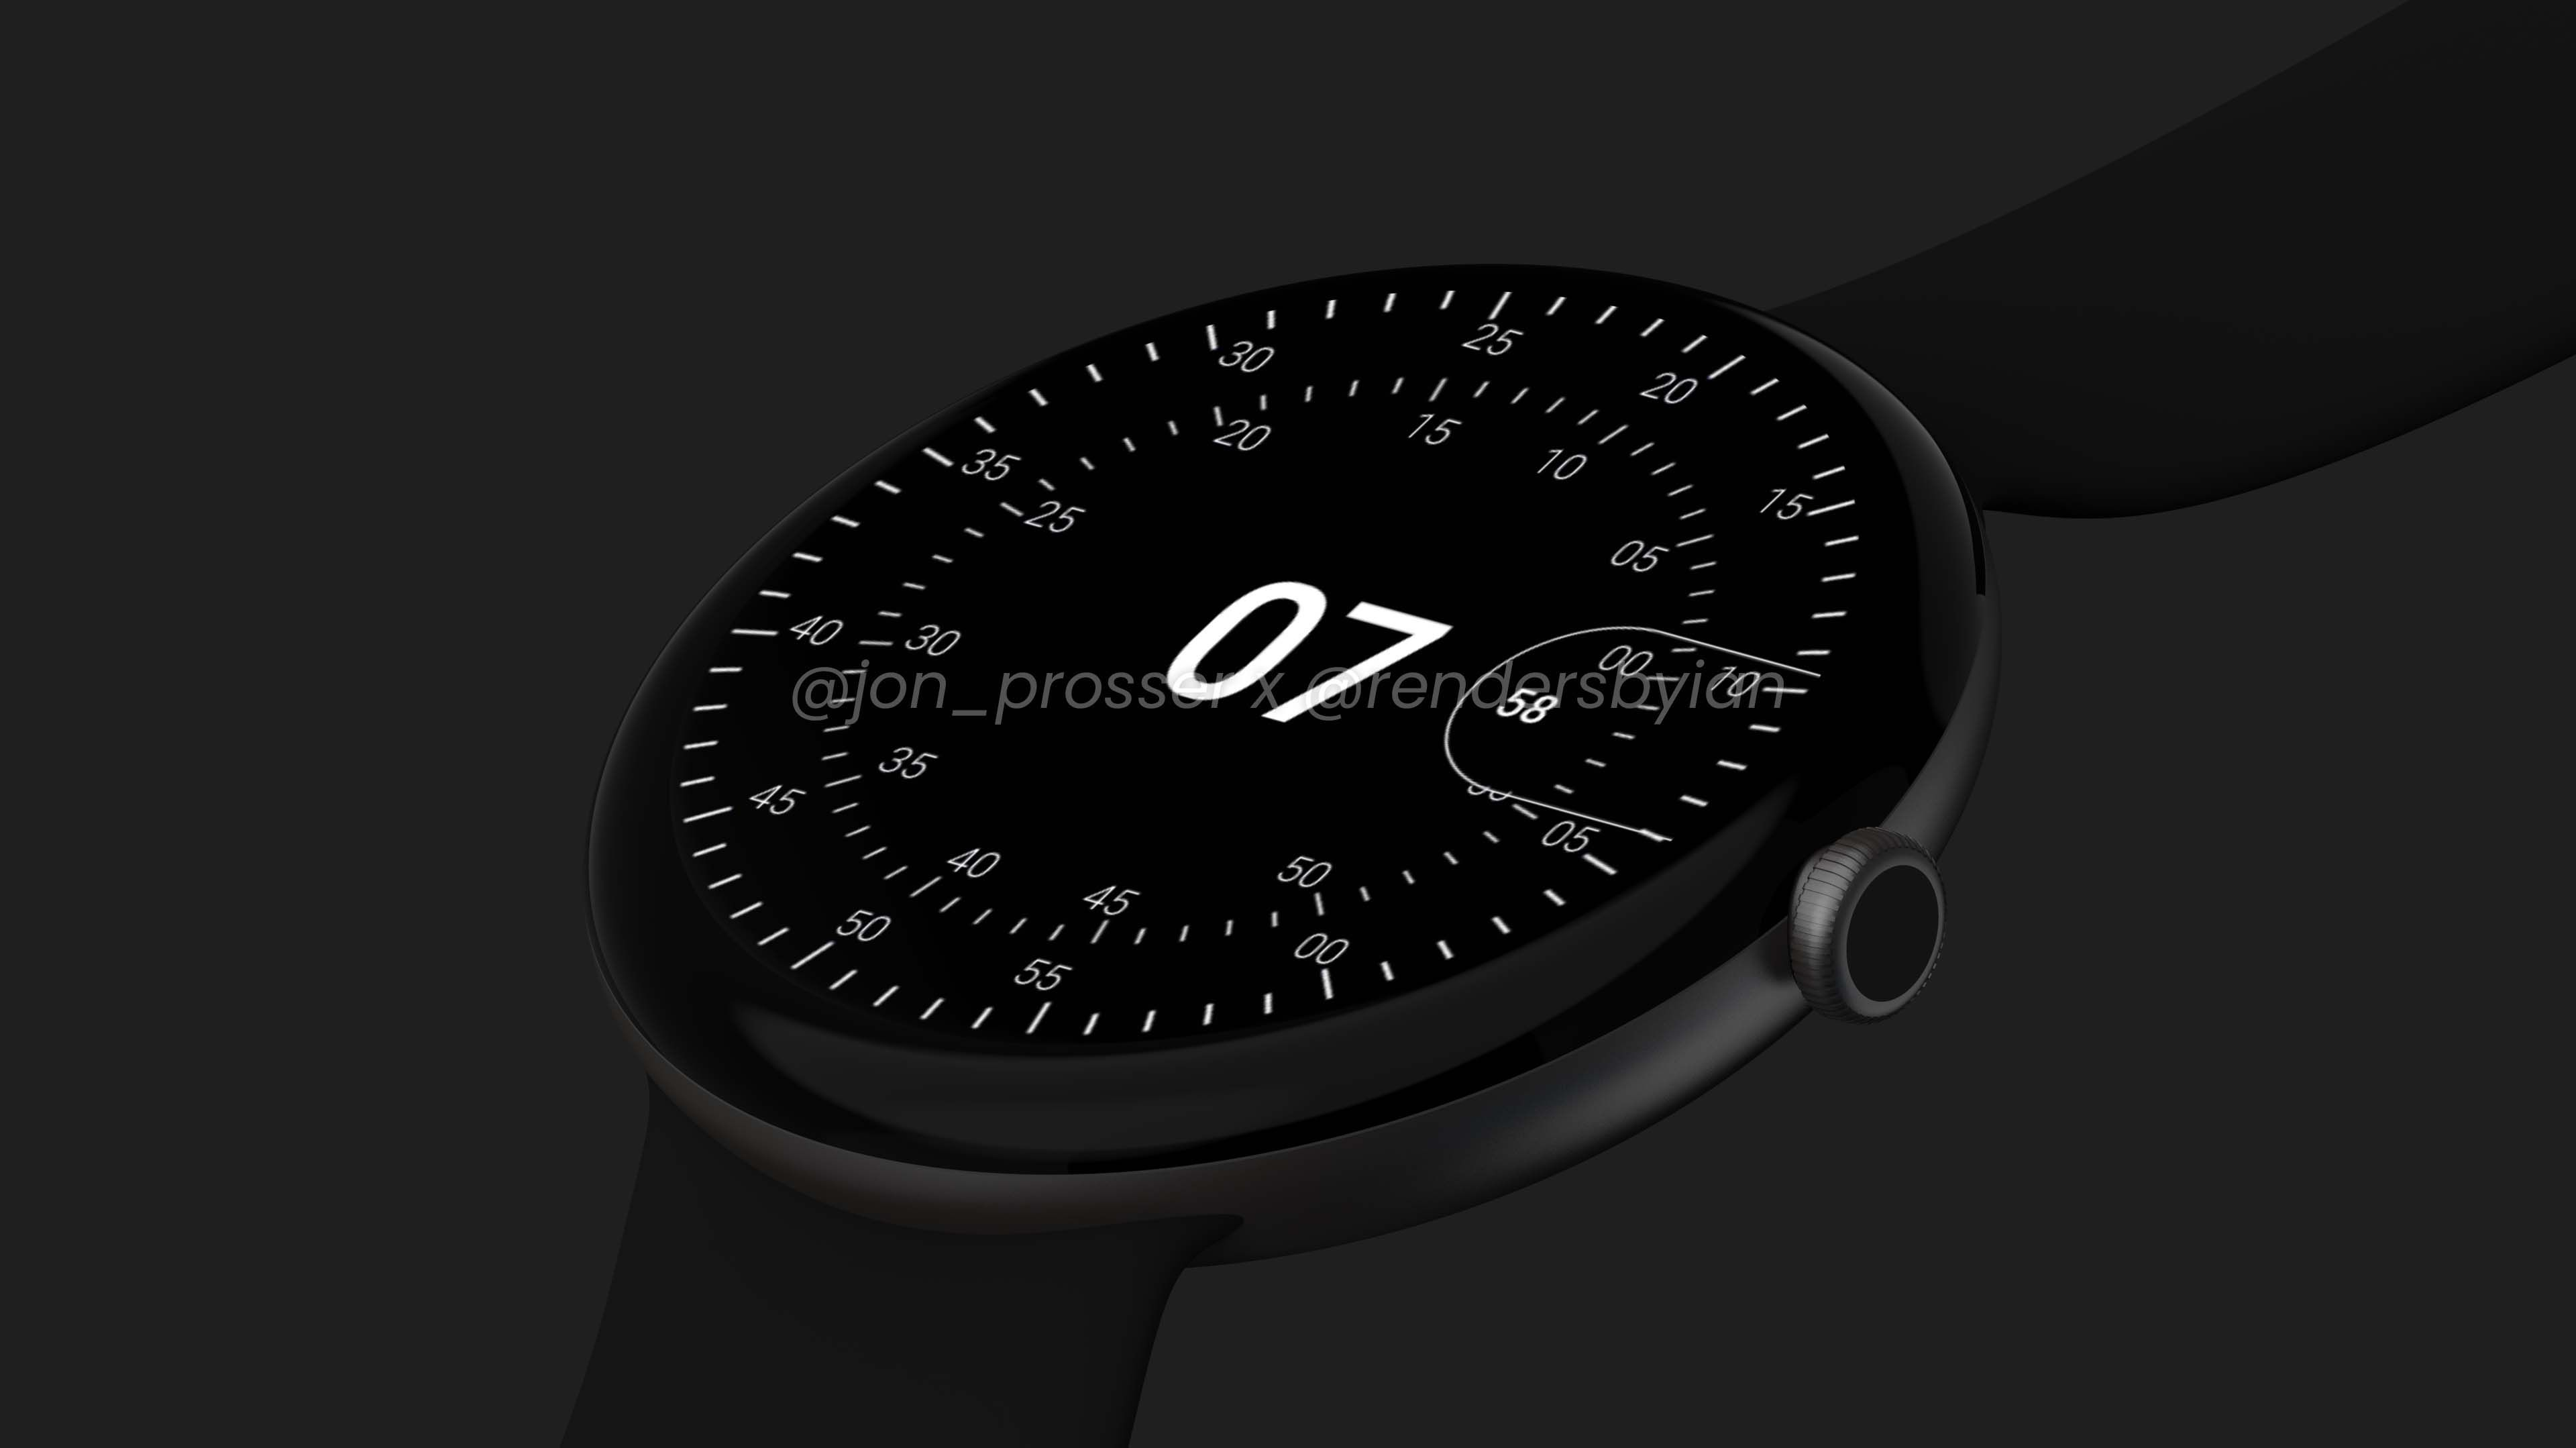 Google Pixel Watch render in black